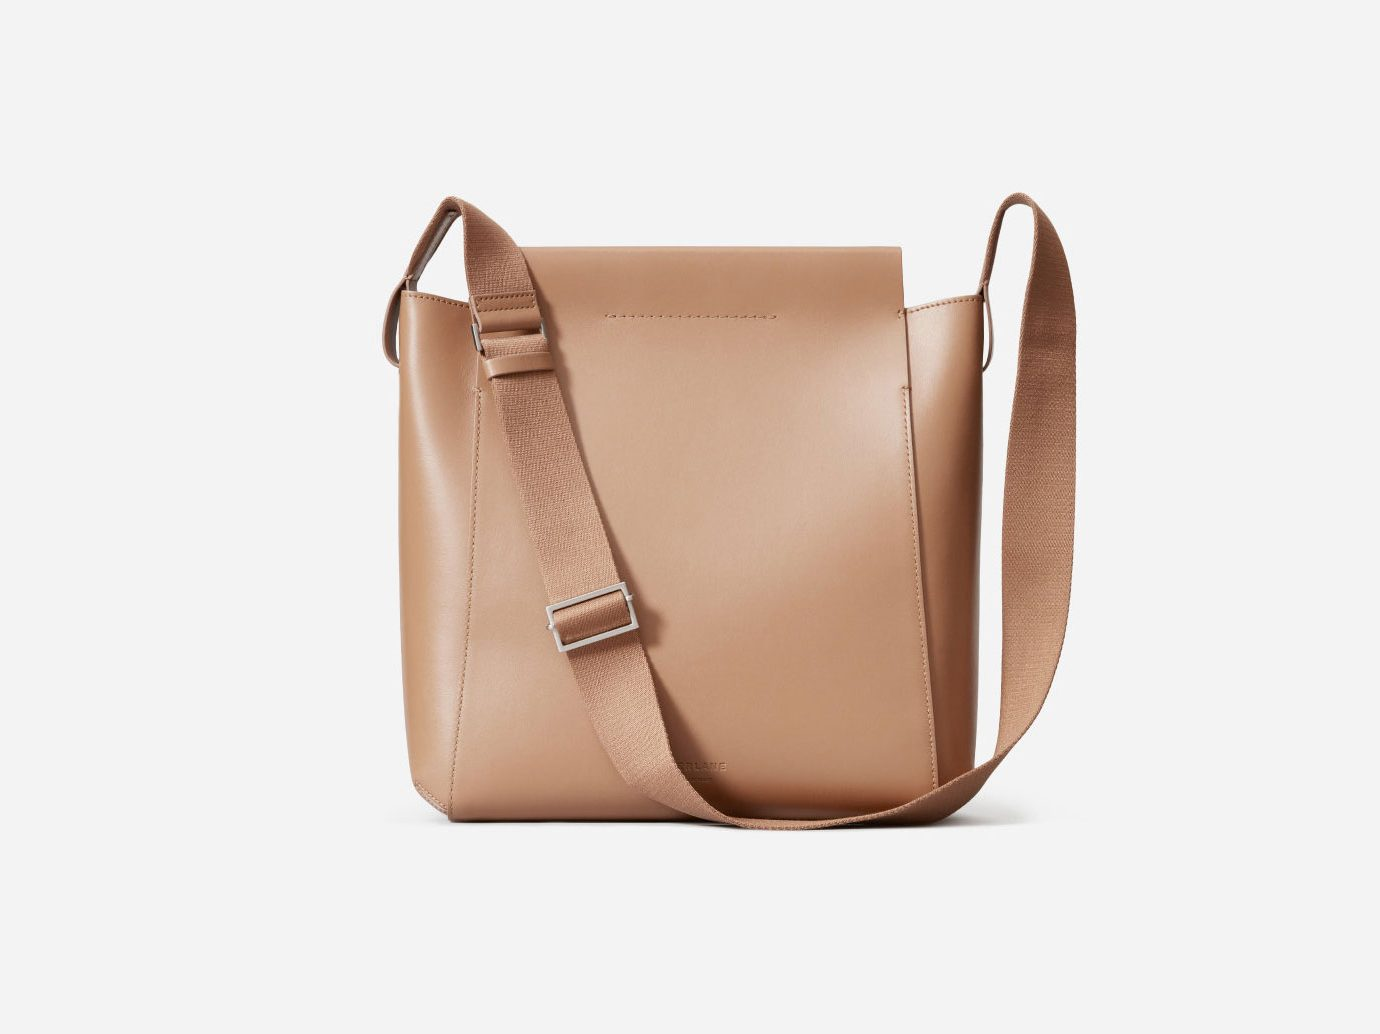 Everlane The Form Bag